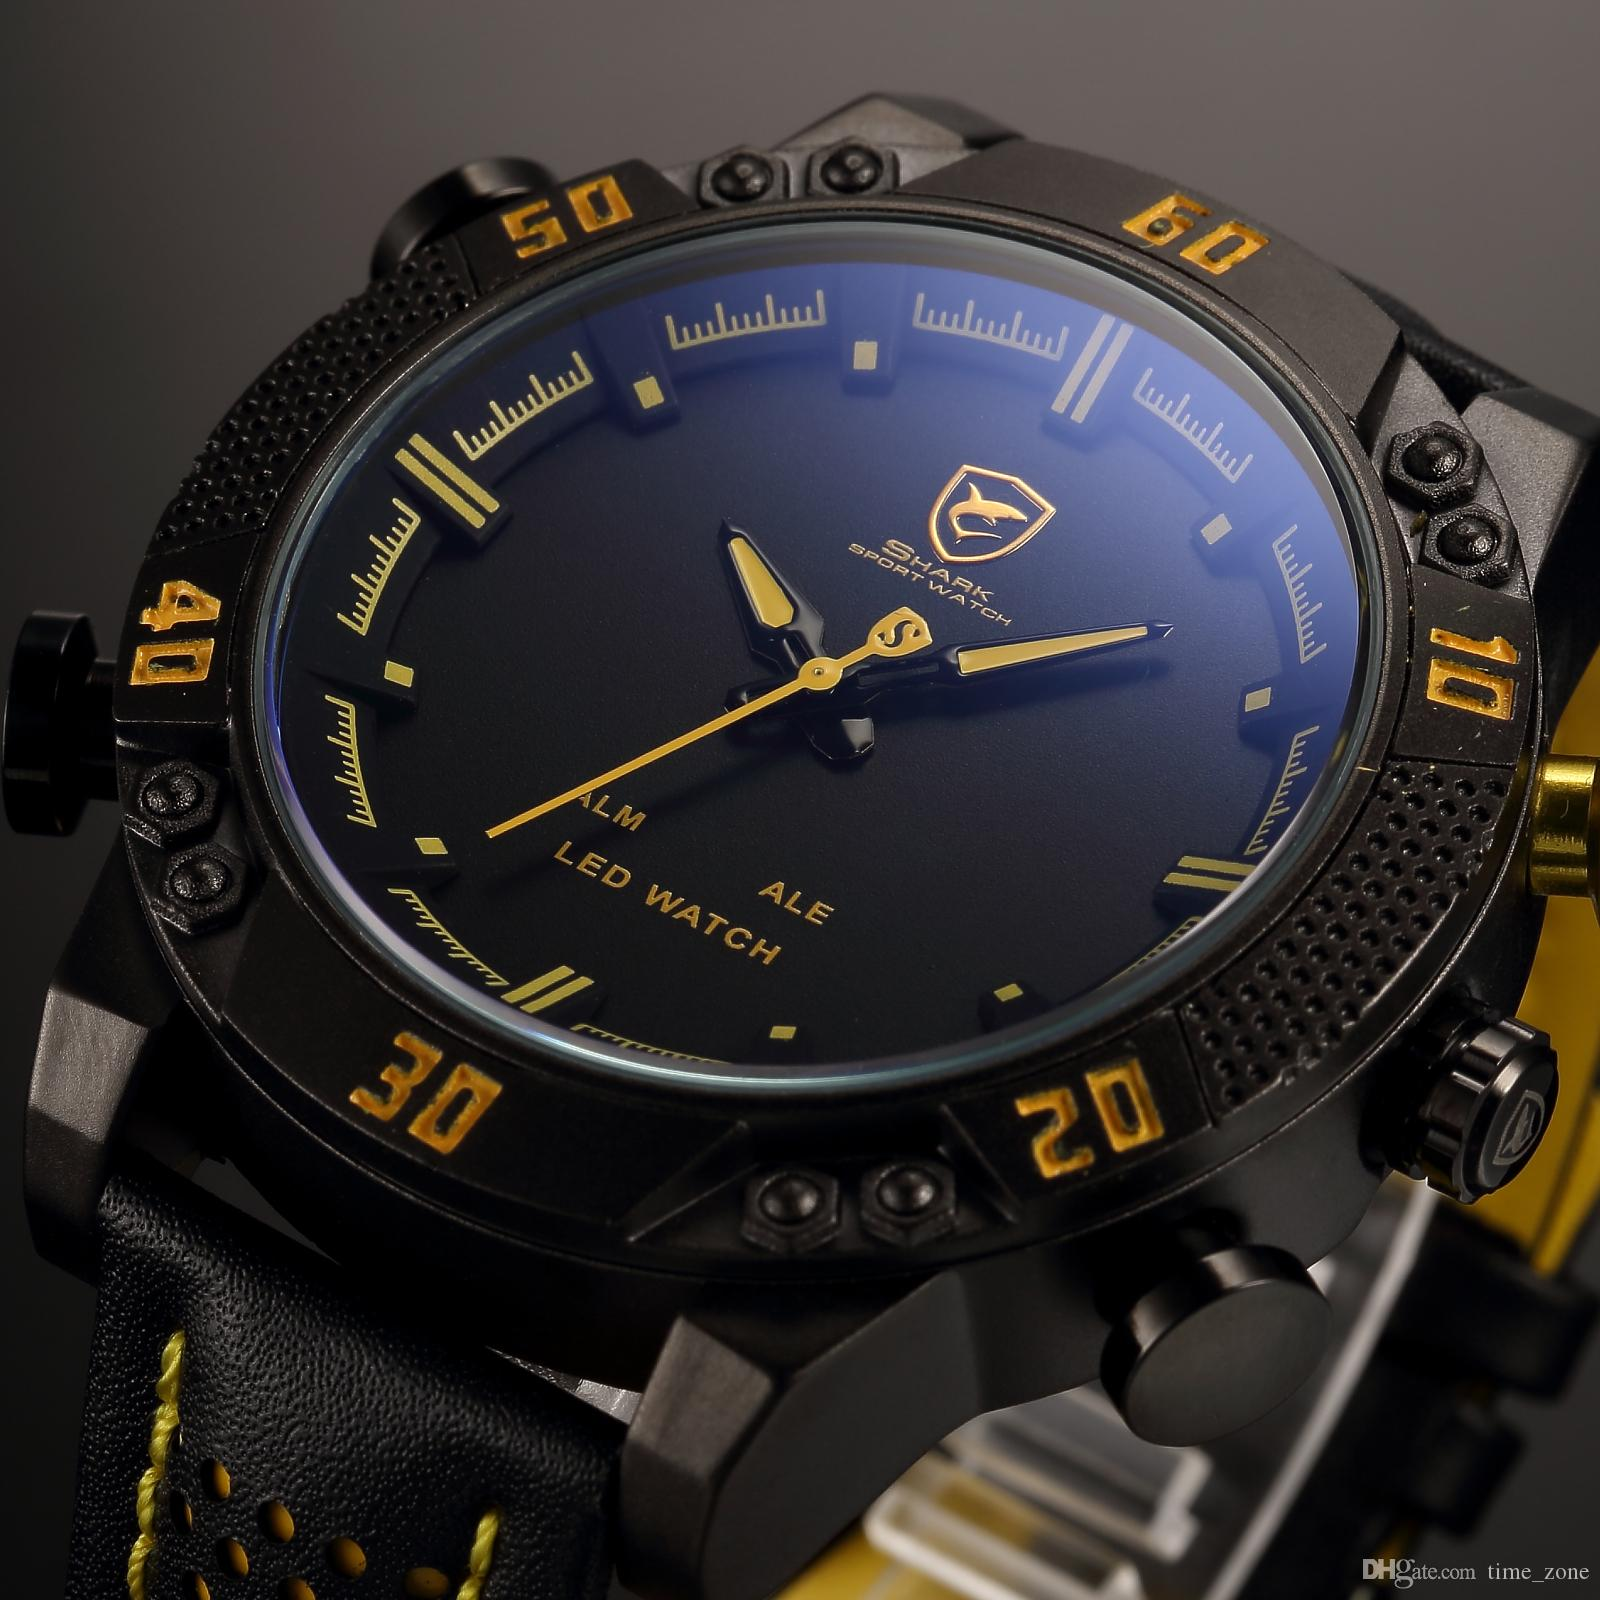 Wrist watches brands for mens - Kitefin Shark Brand Led Men Digital Wristwatch Black Yellow Alarm Leather Band Military Relogio Masculino Wrist Quartz Sport Watch Sh263